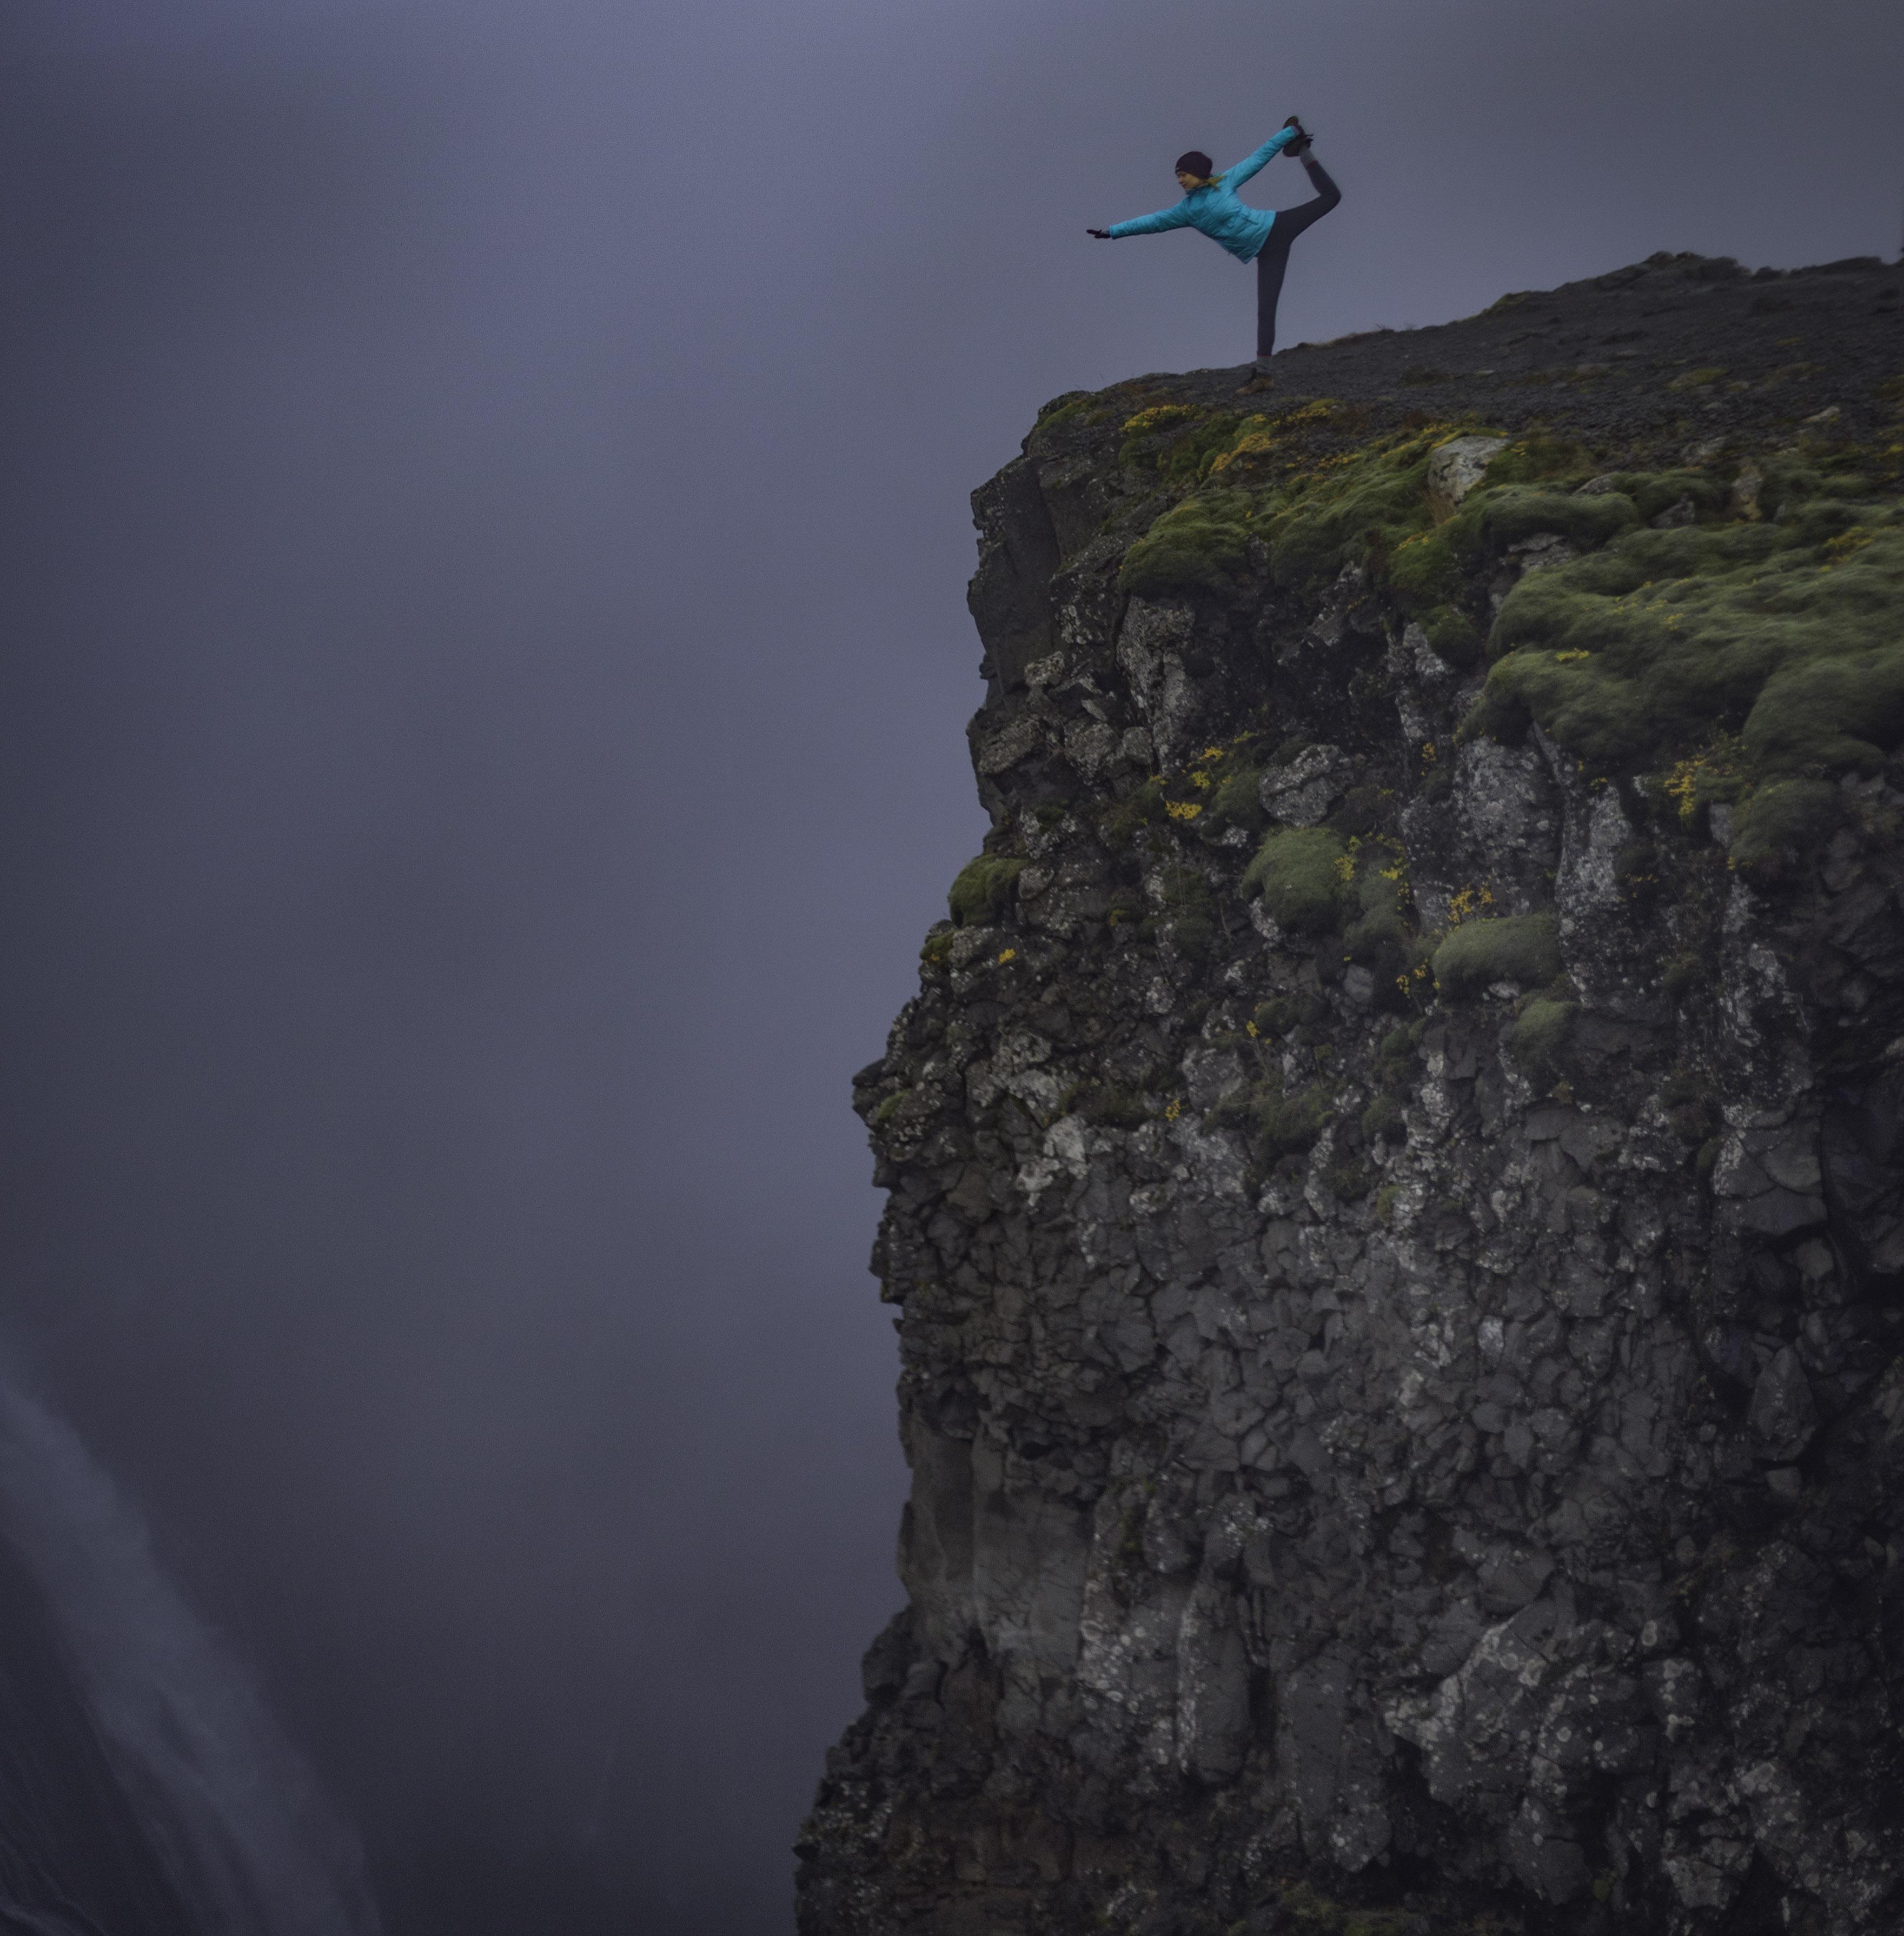 camper van iceland, Dyrholaey, Fjaðrárgljúfur canyon, Gljúfrafoss, Háifoss, Iceland plane crash, Jökulsárlón, lave fields, road trip Iceland, Sejavallalaug pool, Seljalandfoss, Skaftafell waterfall, Skógafoss, Sólheimasandur plane crash, Southern Iceland, southern iceland in three days, Vatnajokull National Park